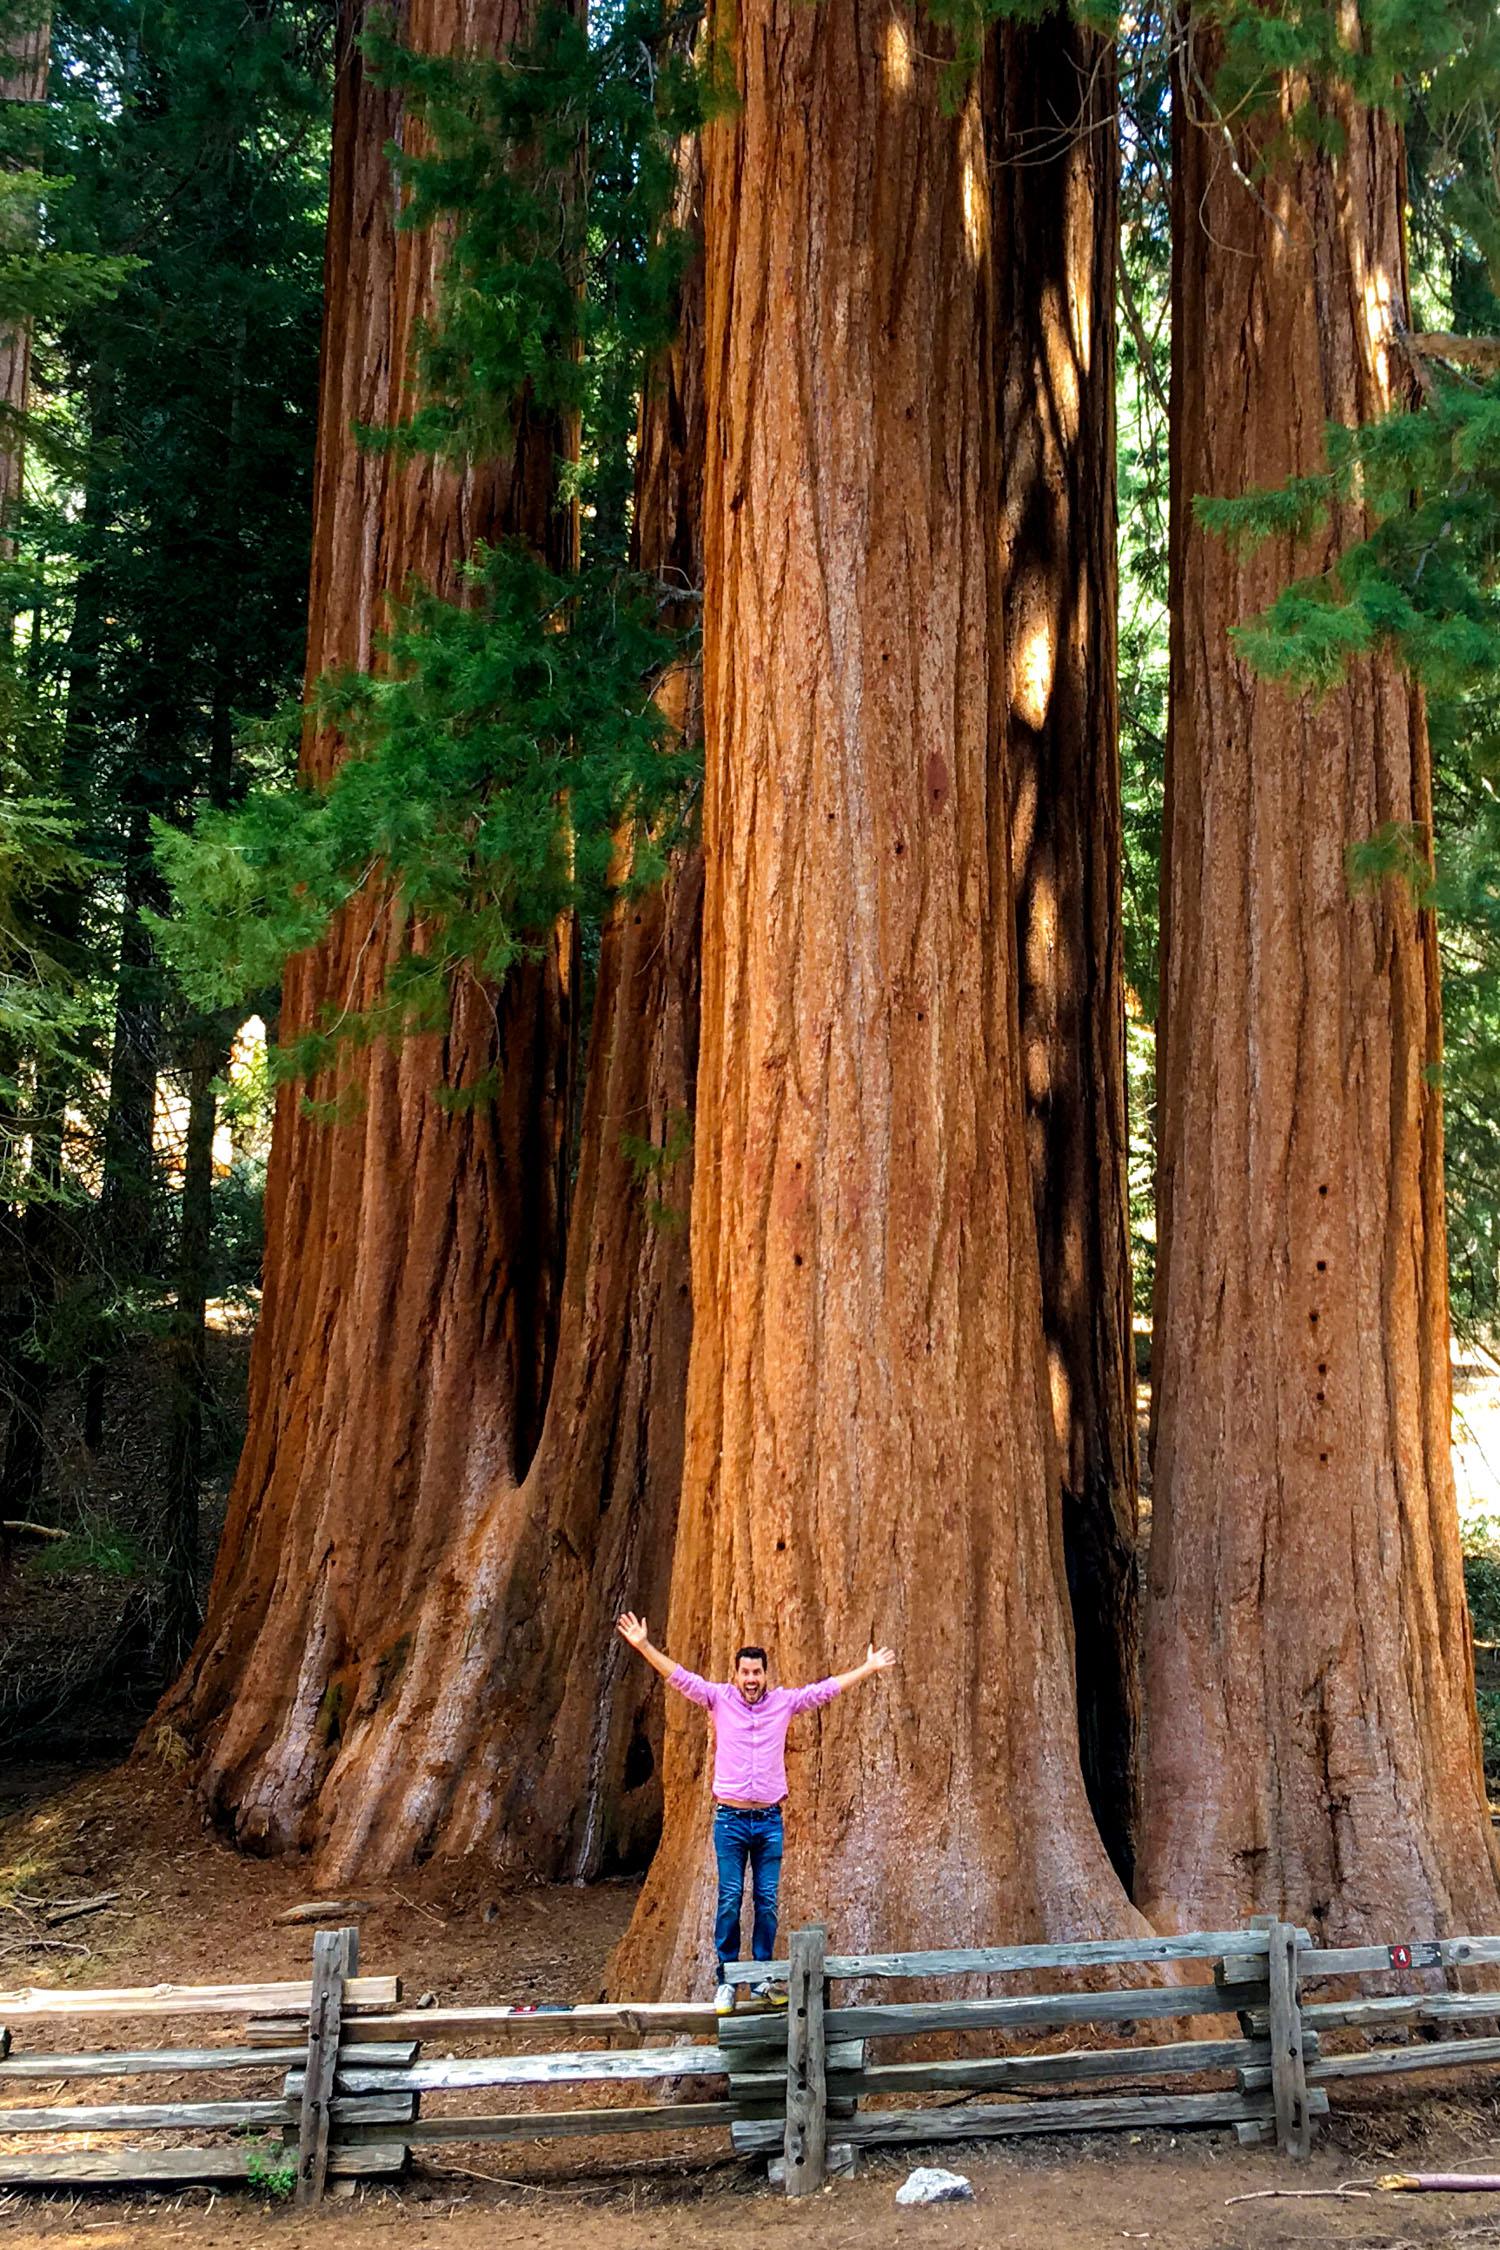 The Sequoia in Desert